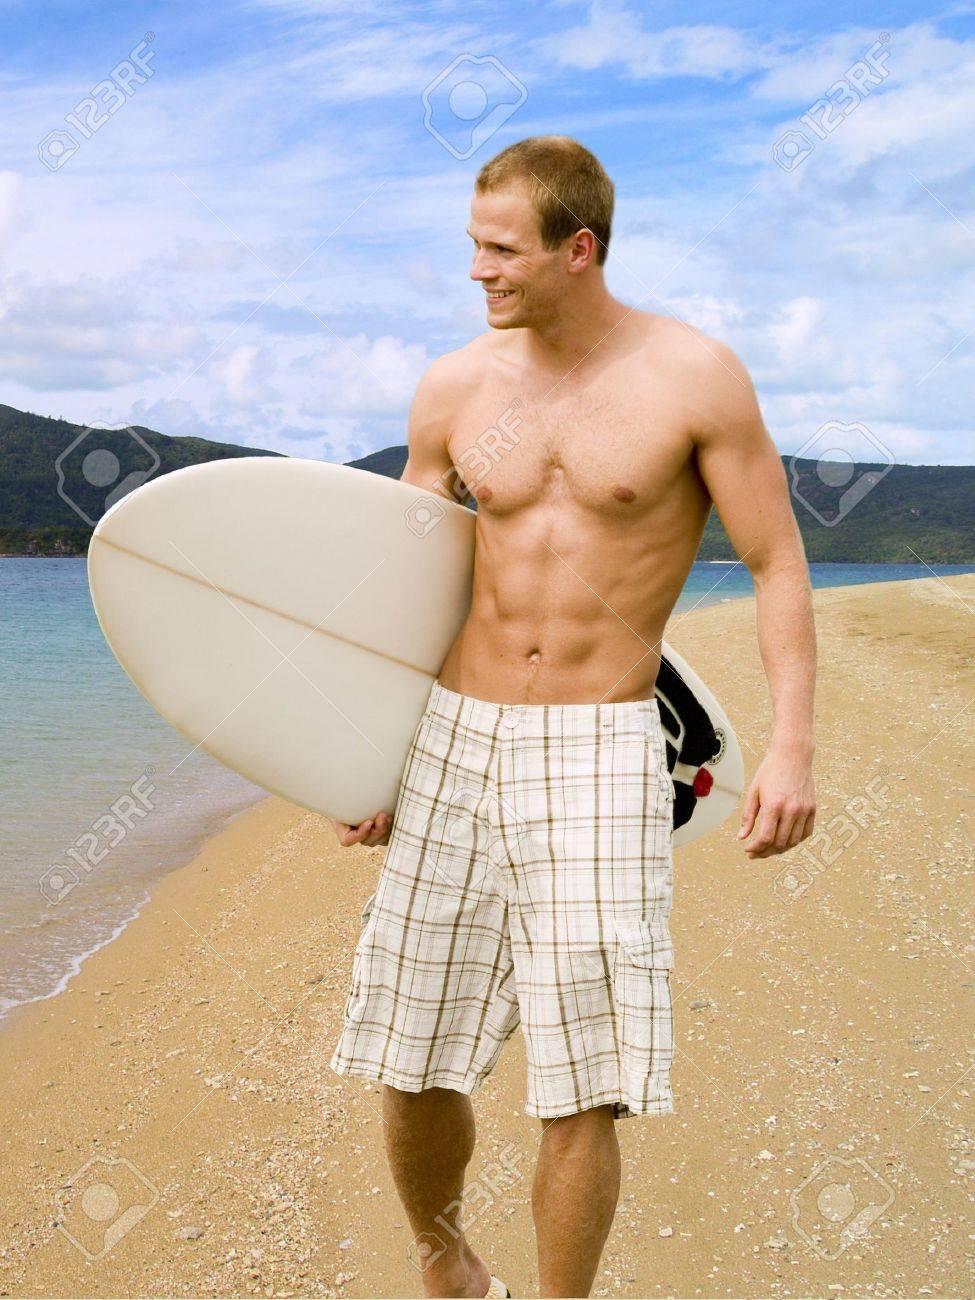 Surfer dude